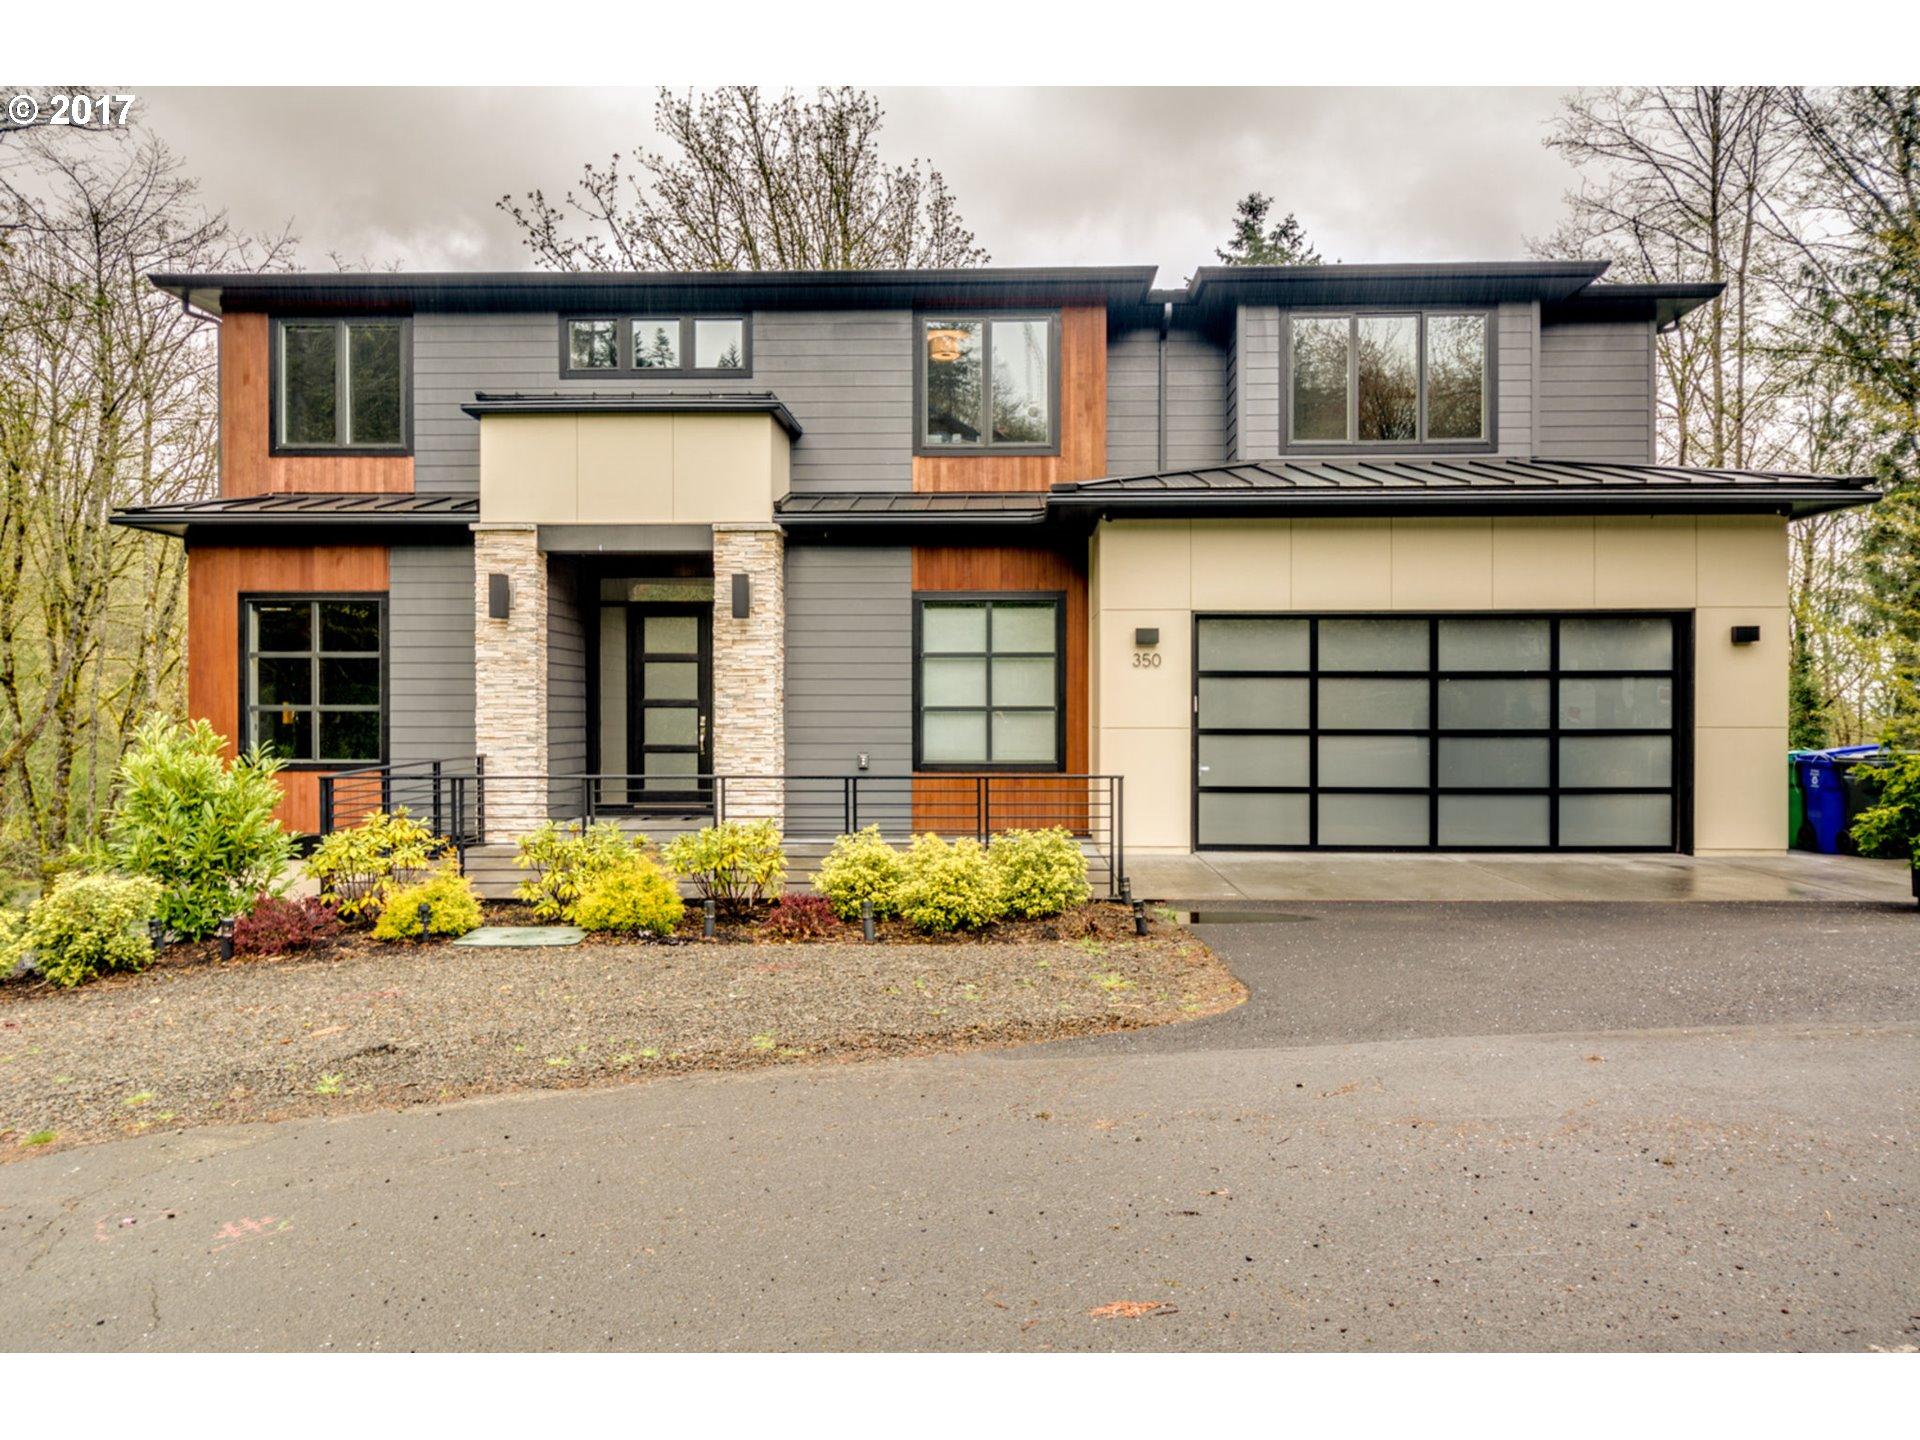 350 NW ROYAL BLVD, Portland OR 97210